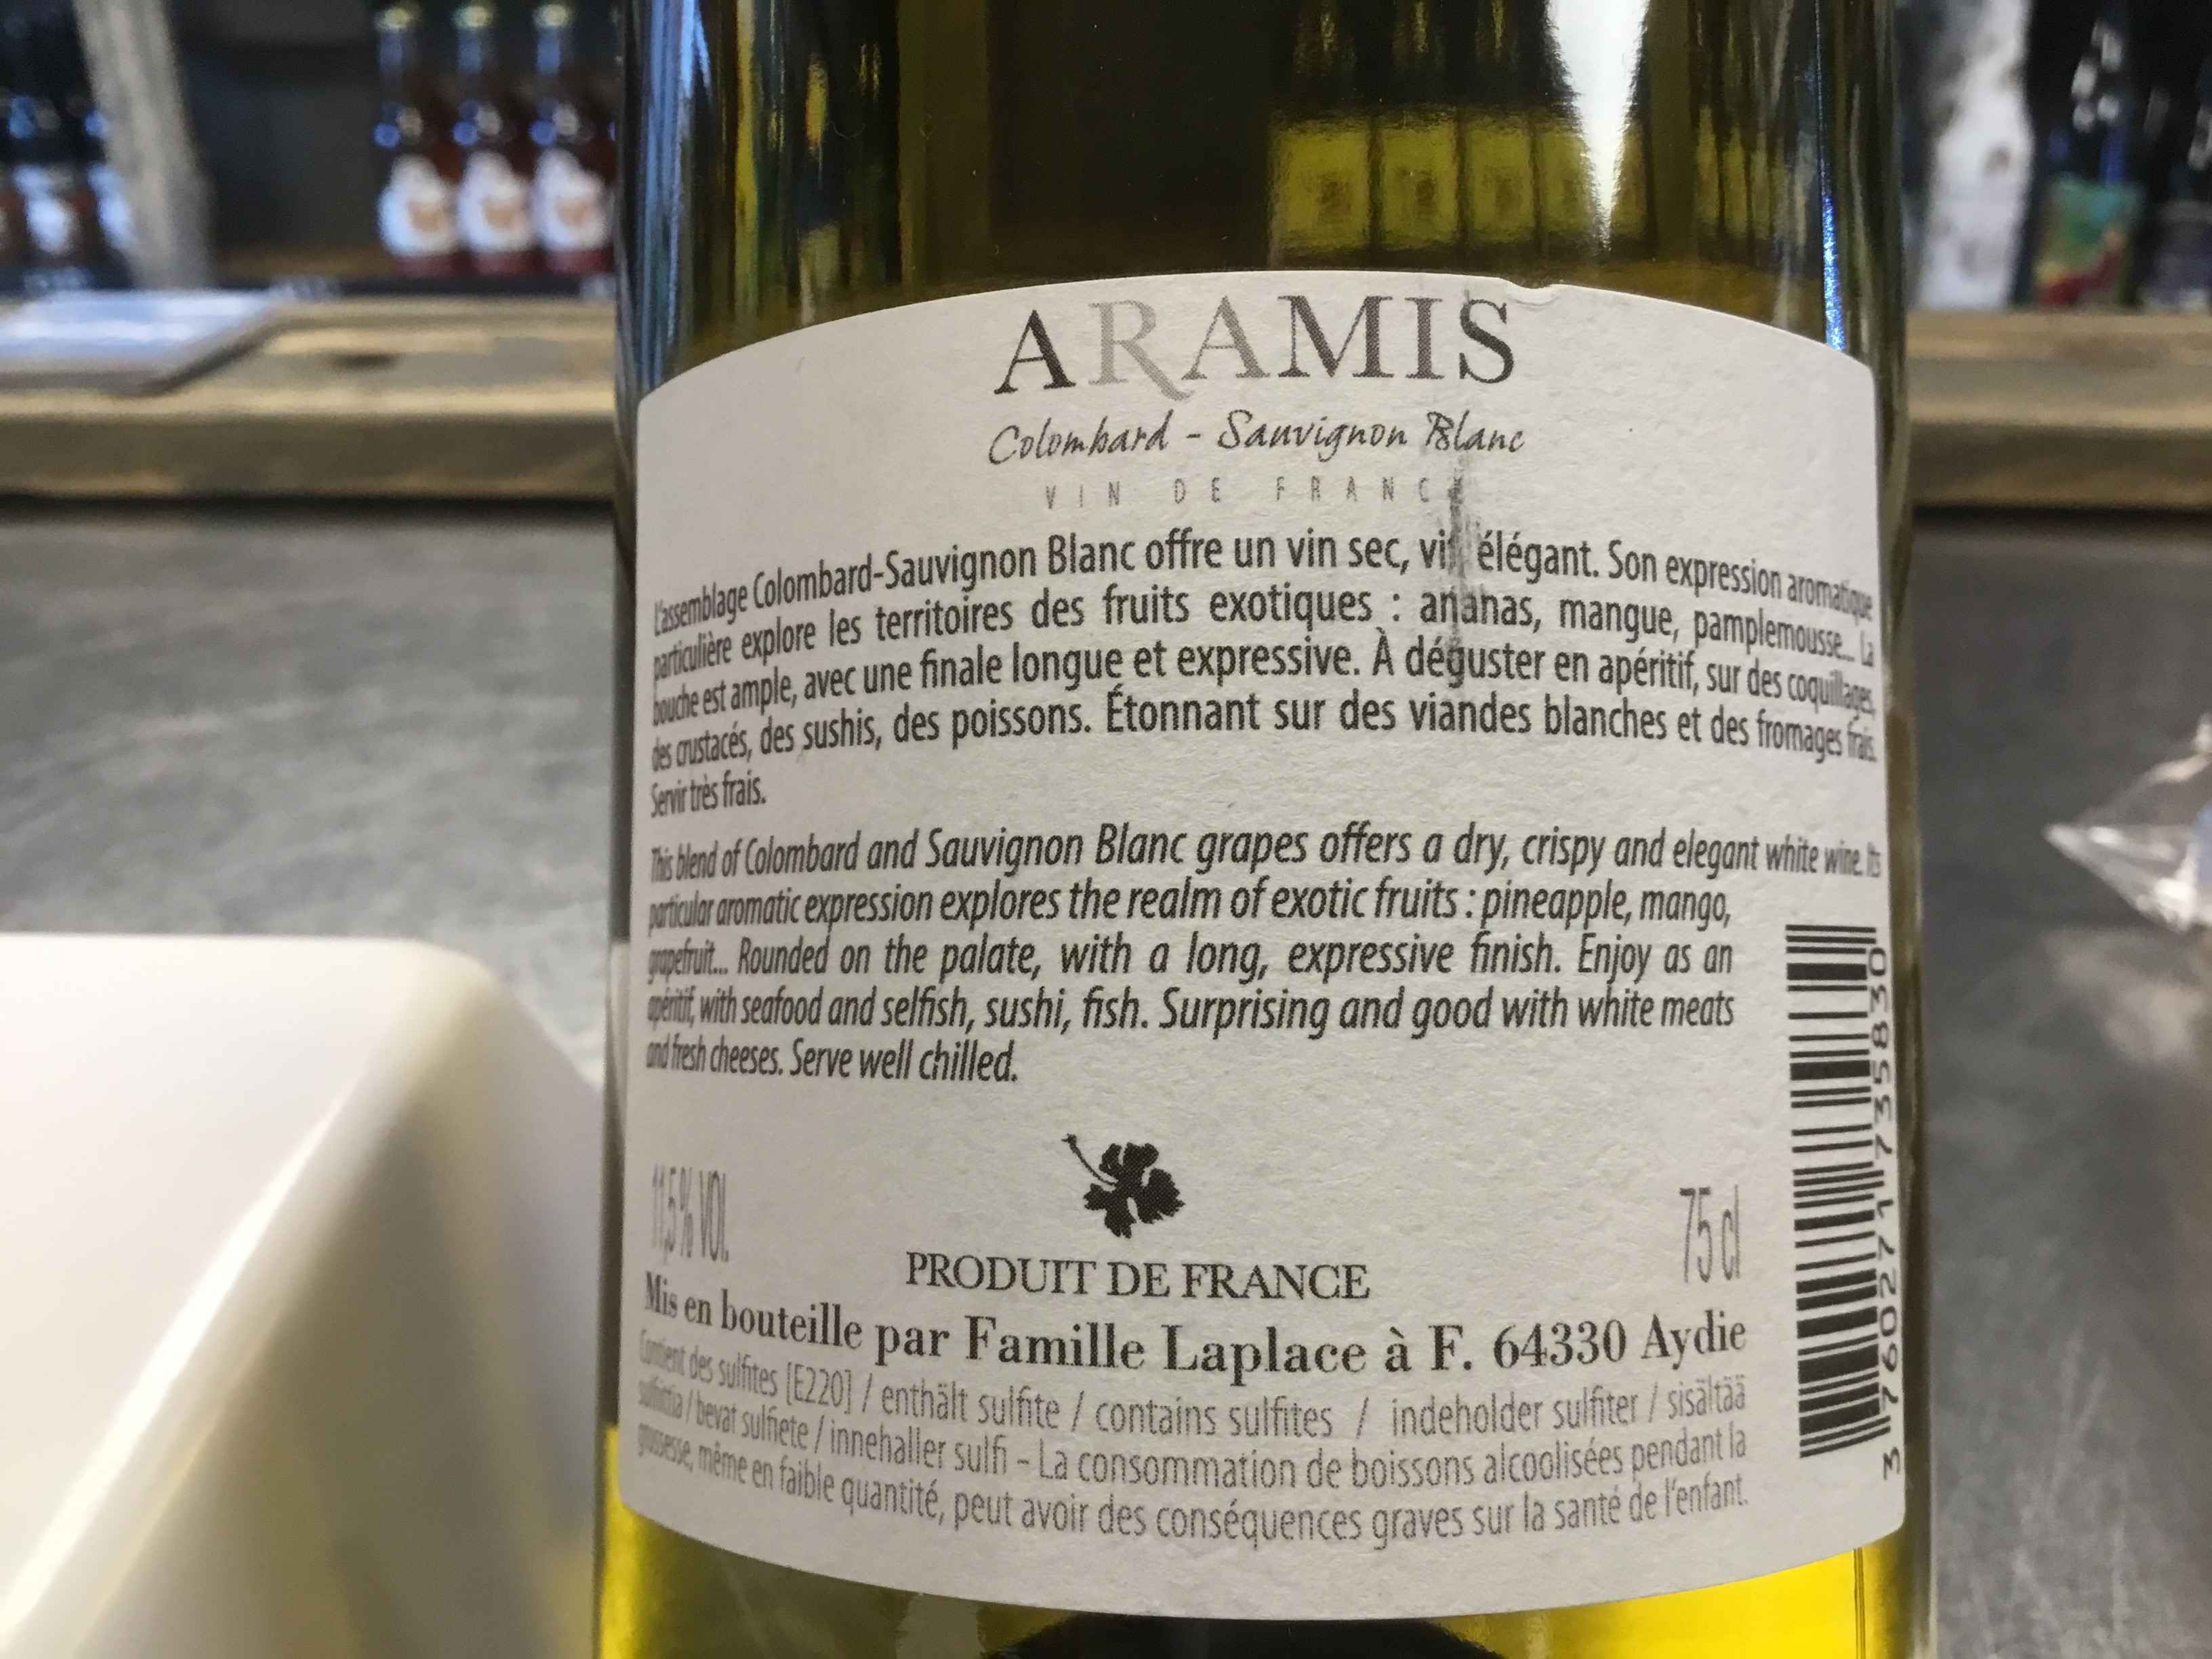 Aramis Colombard Sauvignon 2017 11.5% 750ml Famille Laplace